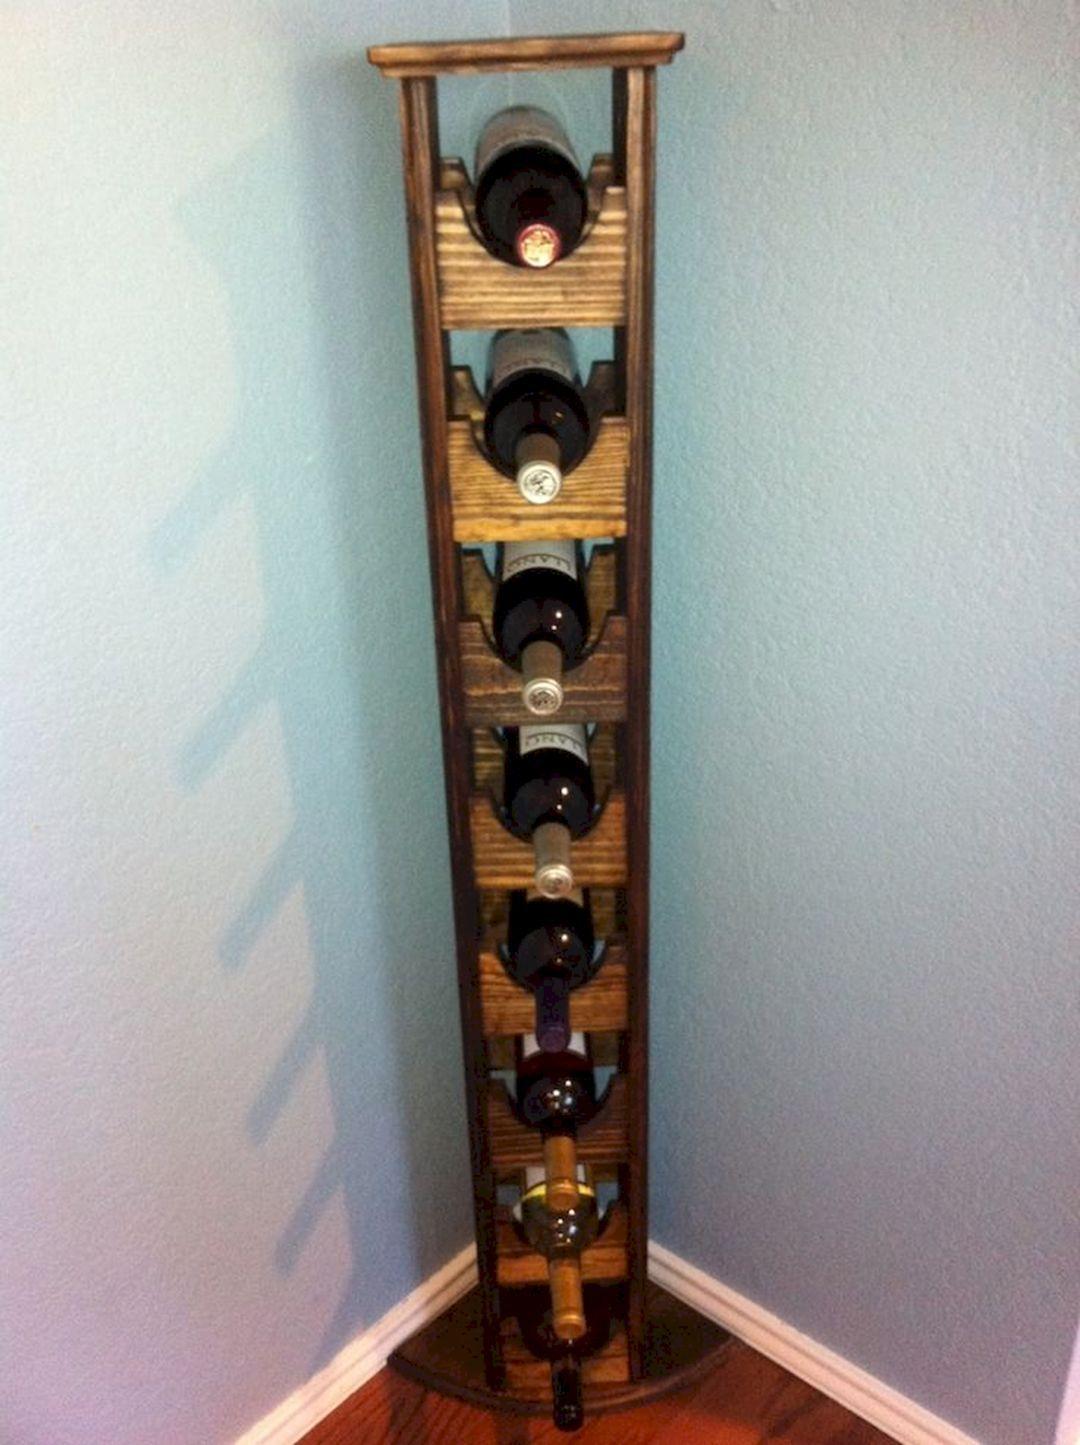 20 Gorgeous Small Corner Wine Cabinet Ideas For Home Look More Beautiful Corner Wine Rack Wood Wine Racks Diy Wine Rack